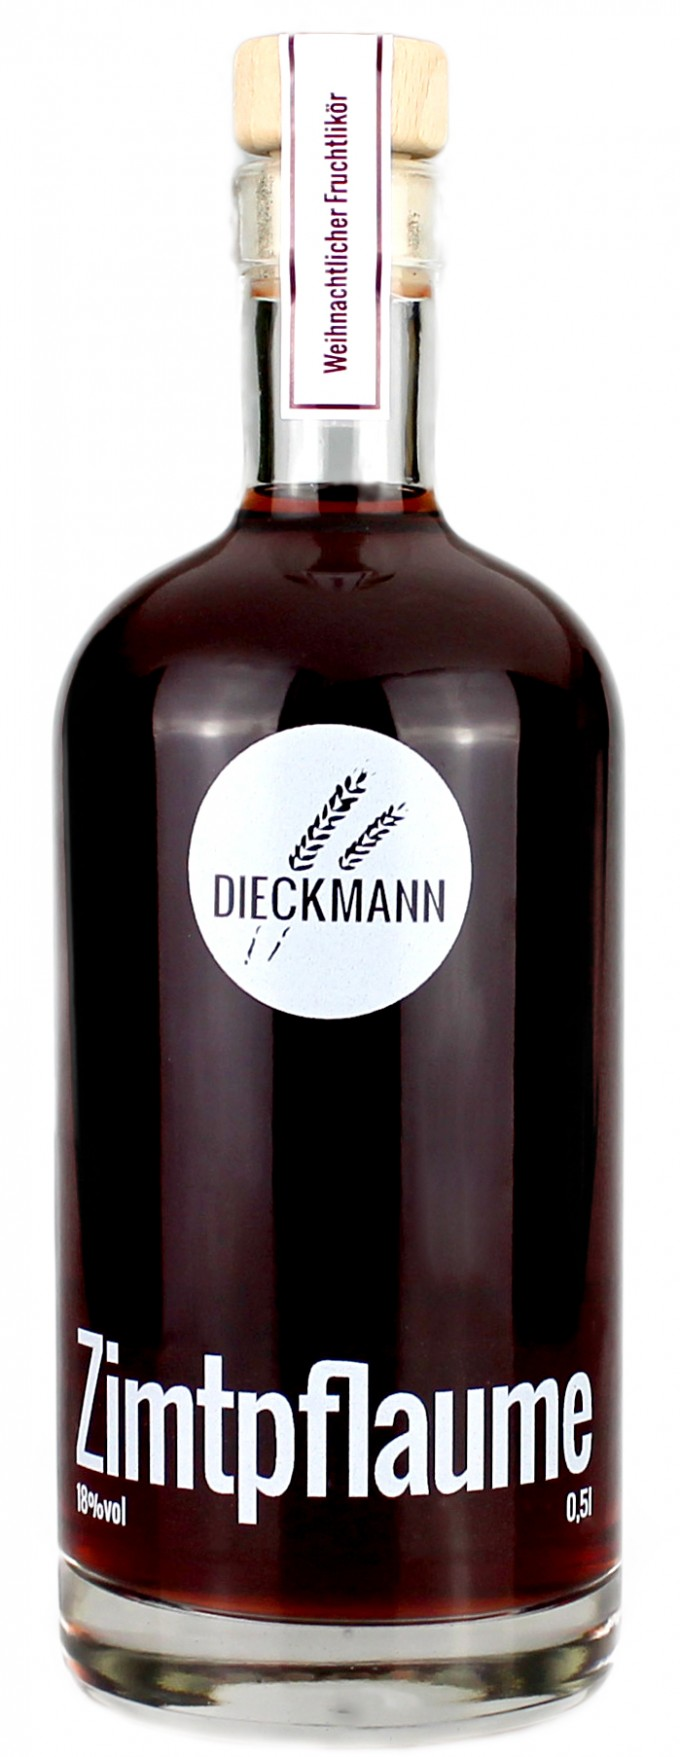 Weizenbrennerei & Likörmanufaktur Dieckmann Zimtpflaume - Fruchtlikör LIKÖR 18%vol., 0,5l